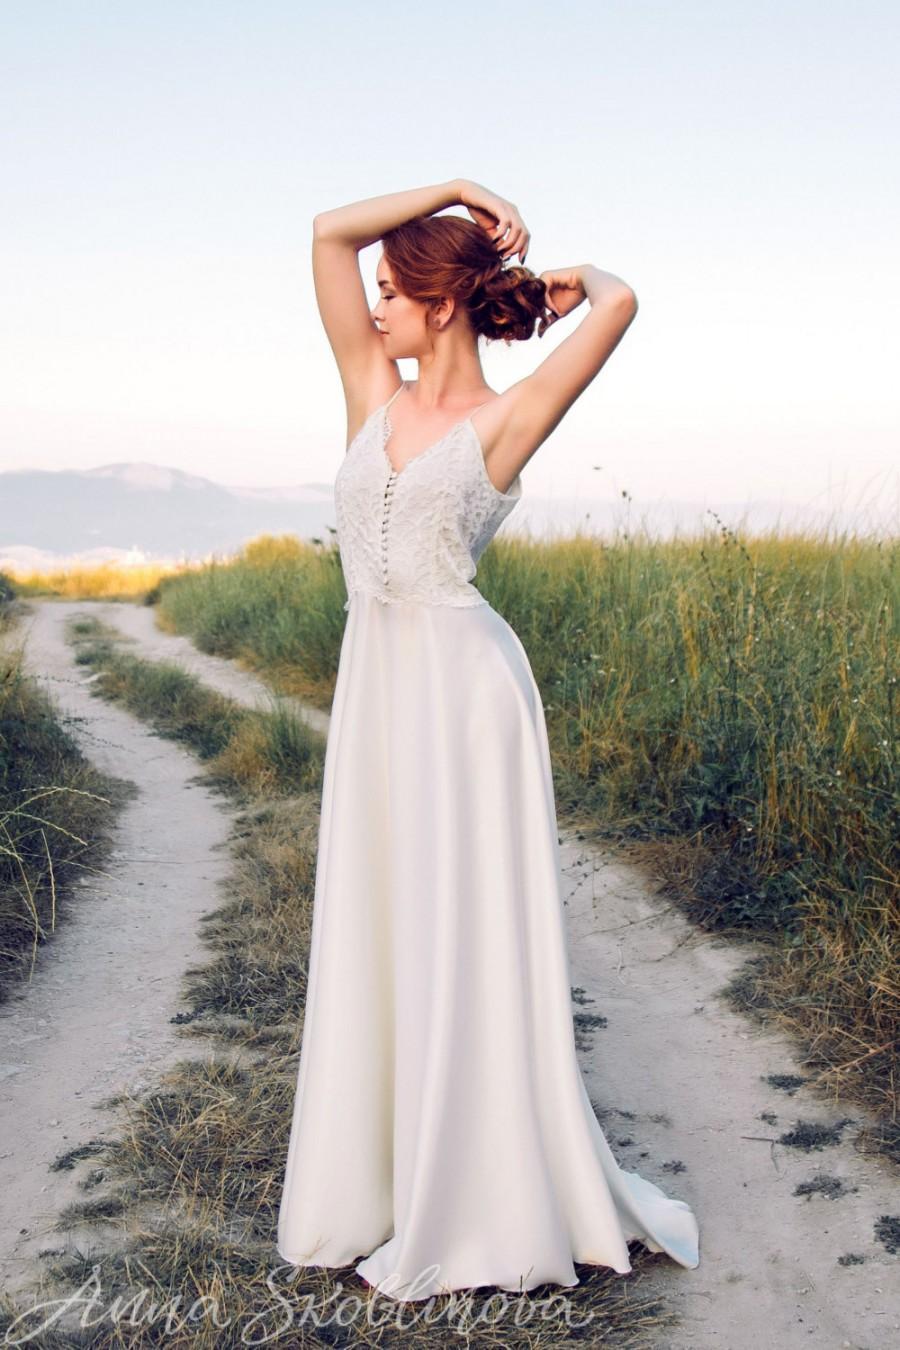 Wedding - Silk dress, Silk wedding dress, Silk gown, Simple wedding dress, Simple prom dress, Simple gown, 0002 // 2016